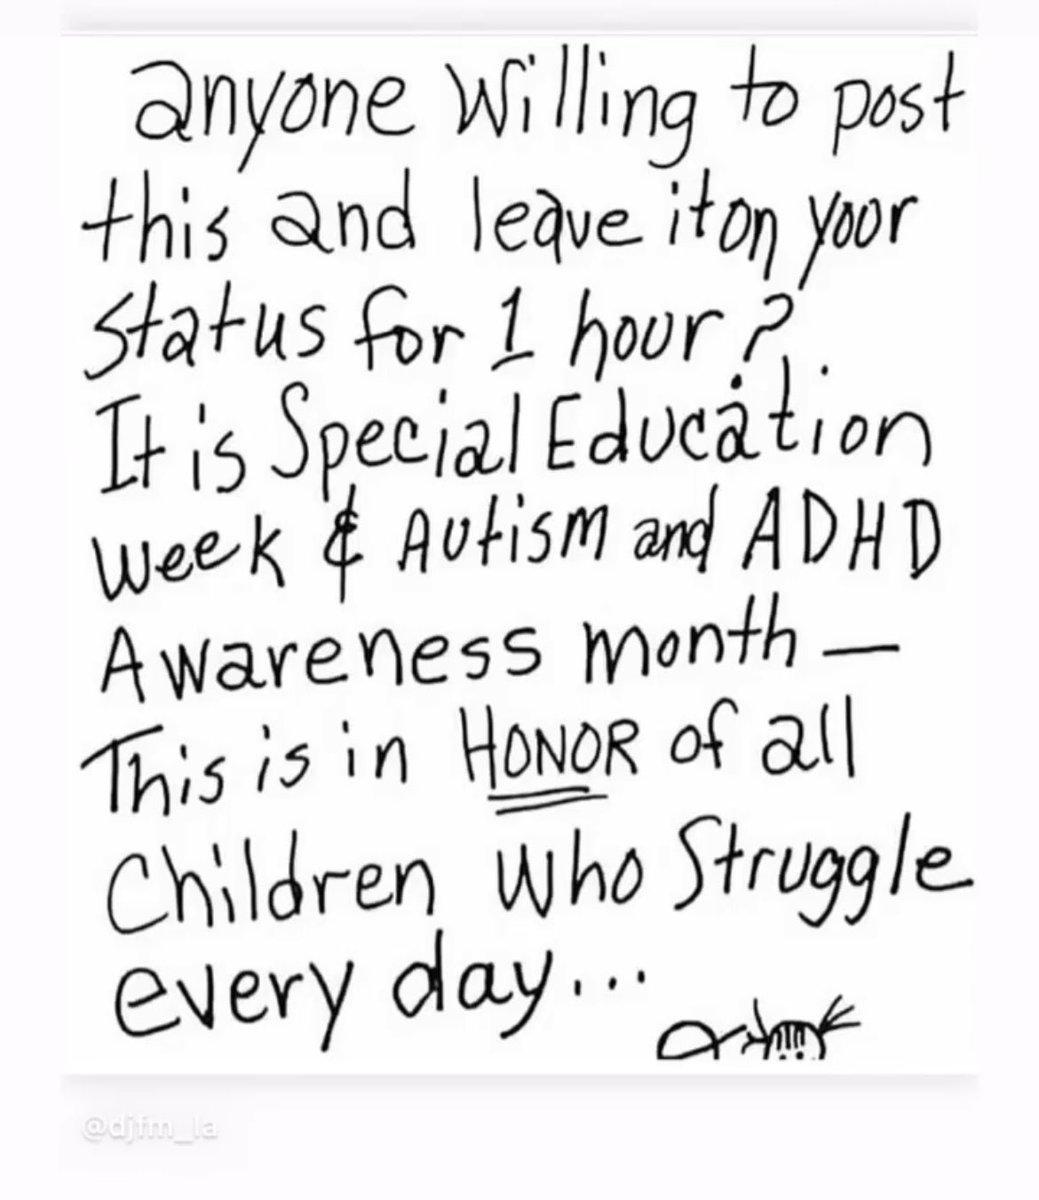 Replying to @teeco71: #SpecialEducationWeek #autismawareness #adhdawareness